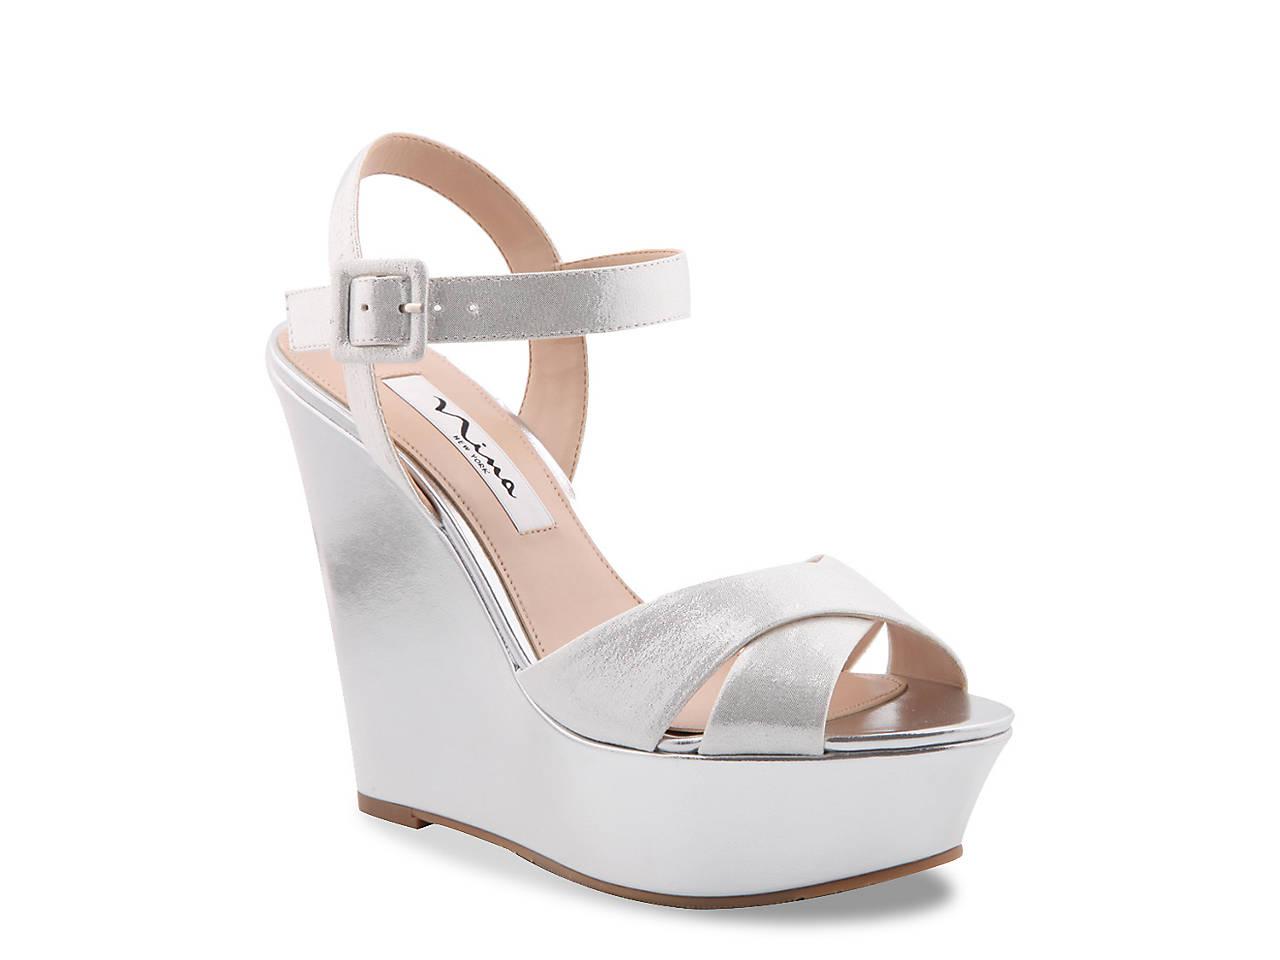 86420f4afd2 Nina Jinjer Wedge Sandal Women s Shoes